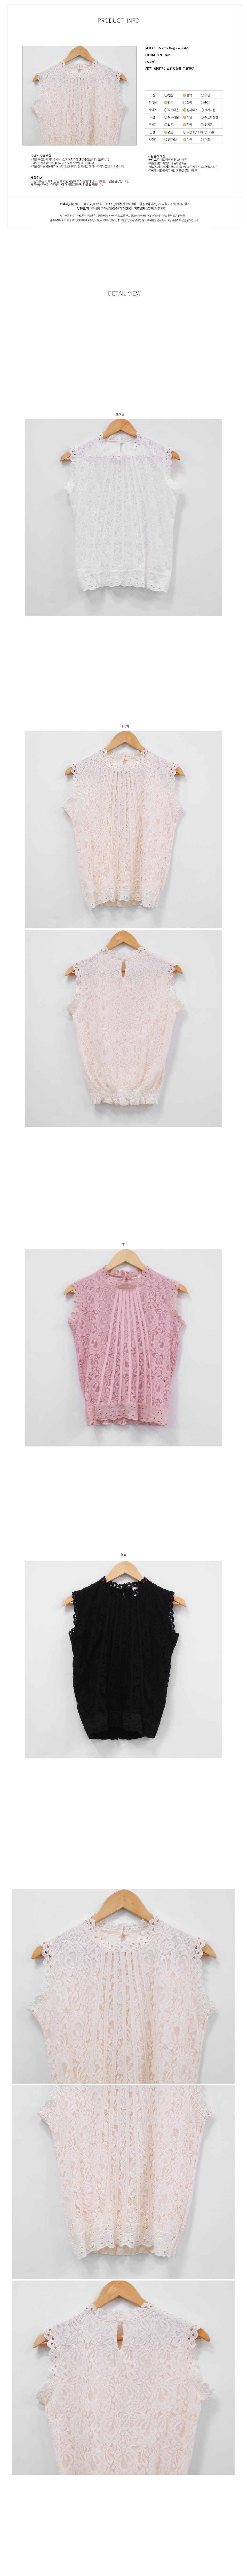 Farmed Lace Sleeveless Blouse